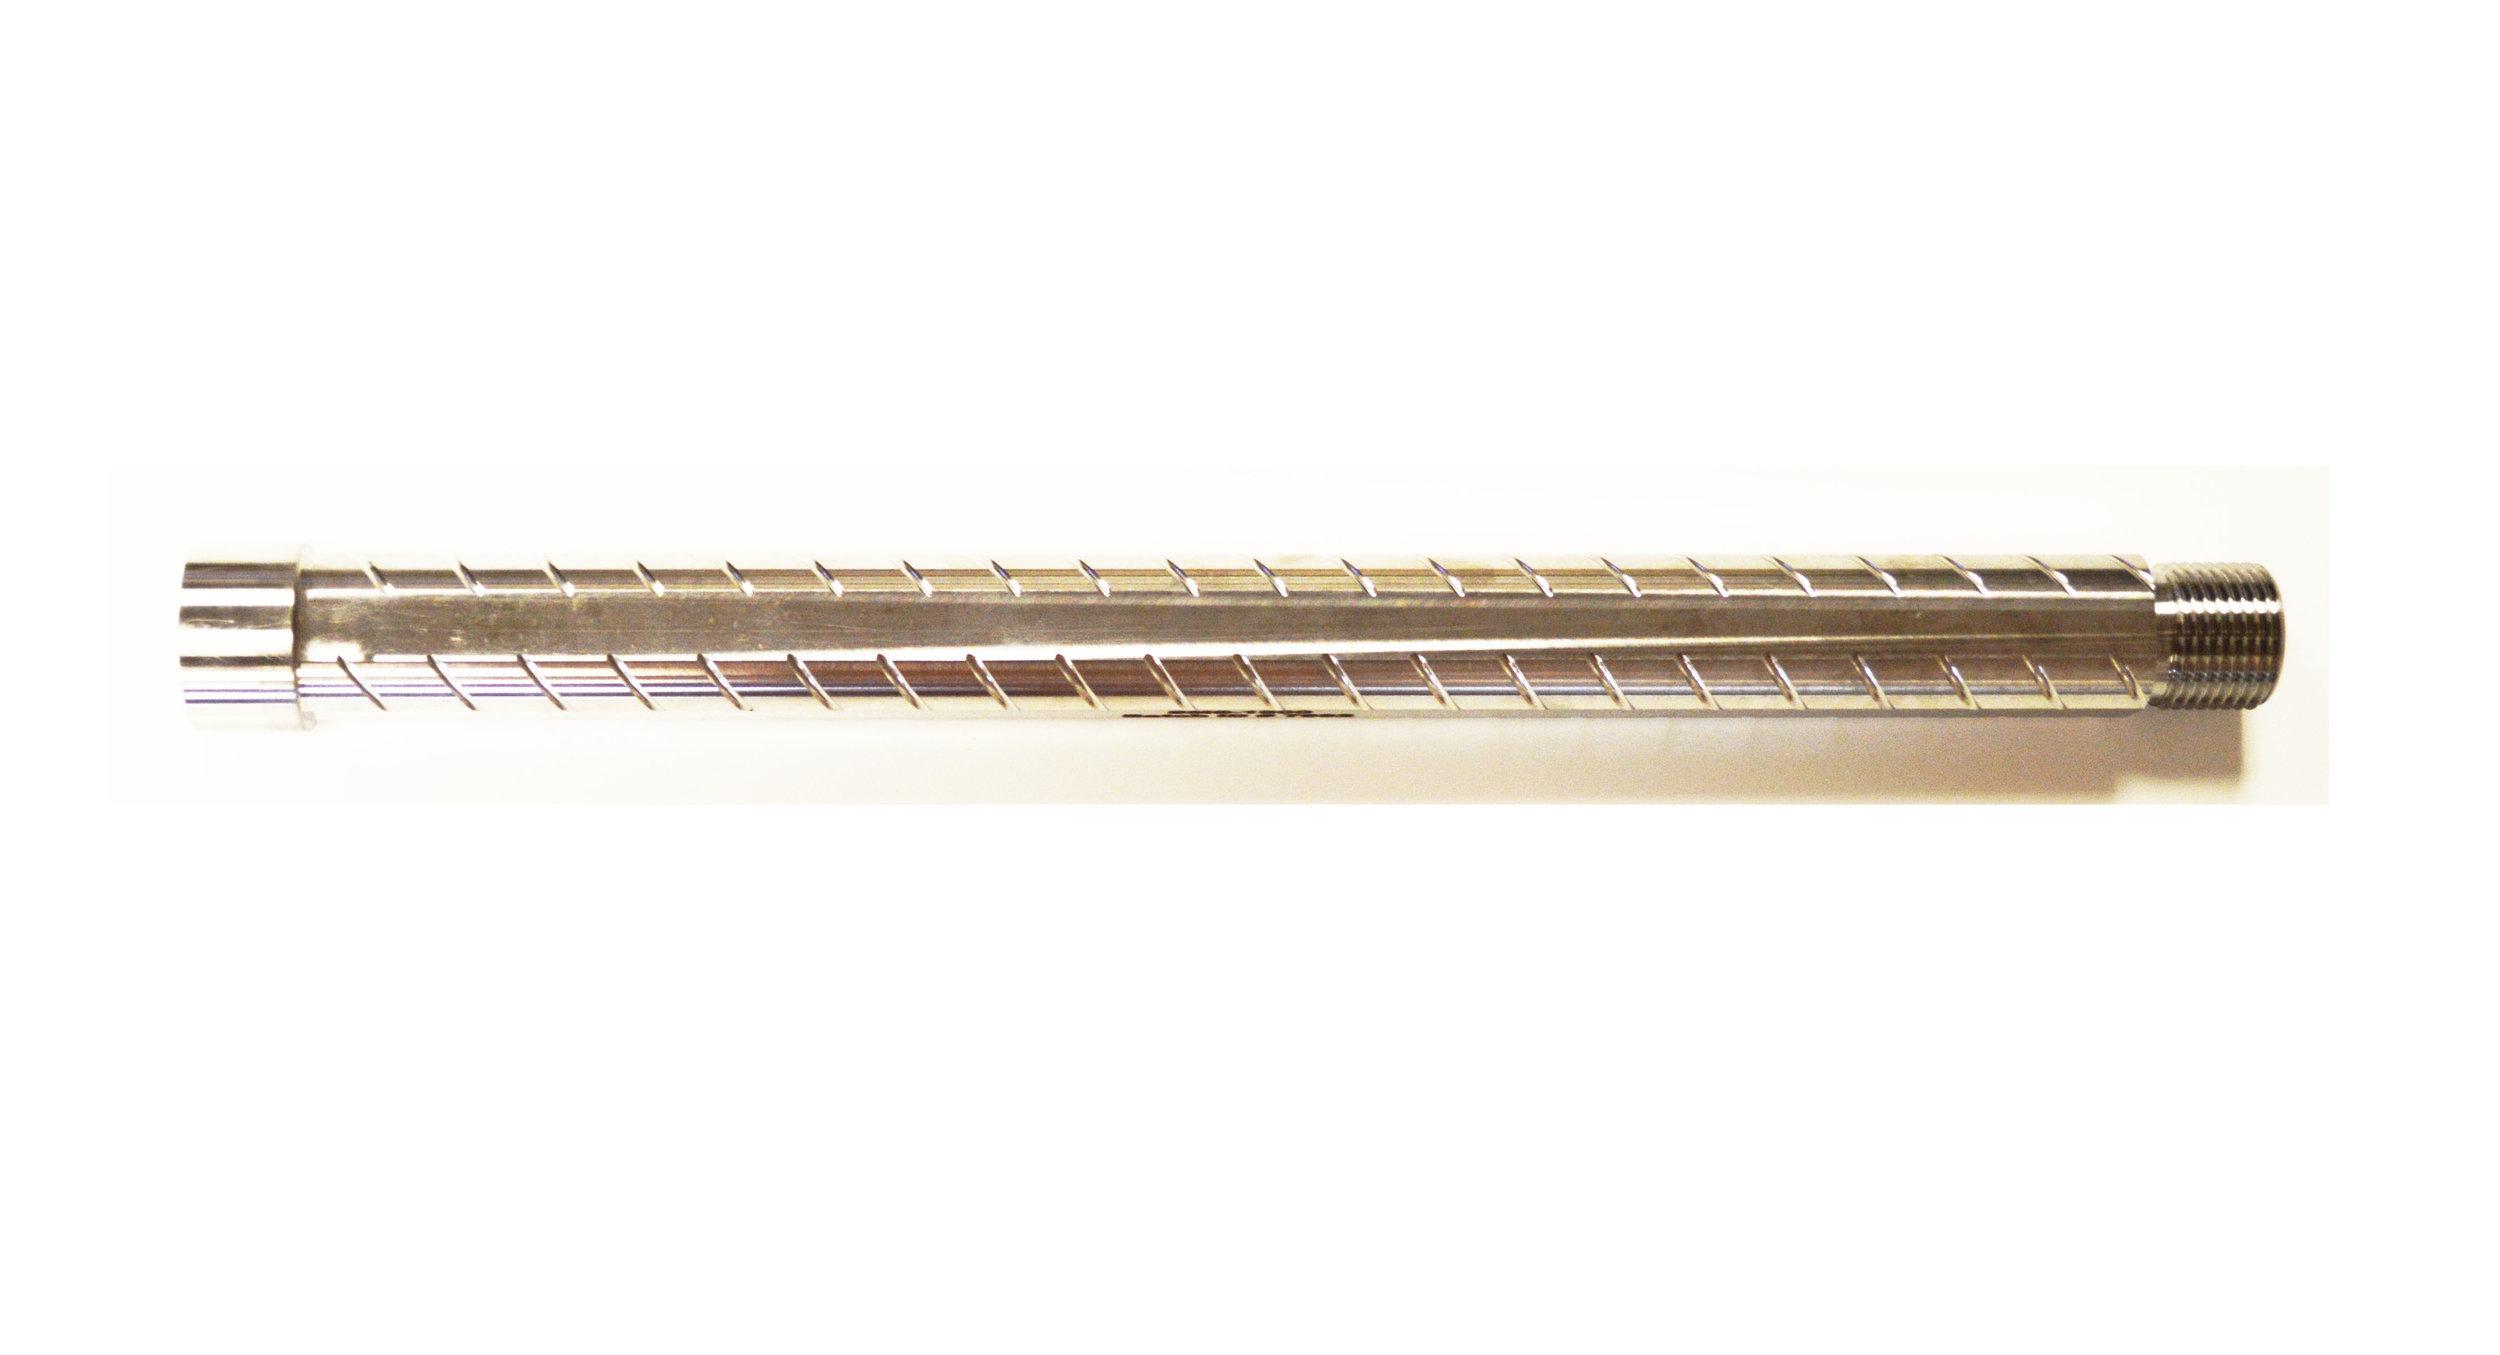 Signal Valve Shaft        17-4 Stainless Steel         Spiral: SMS-1600        Slick: SMS-1600-01